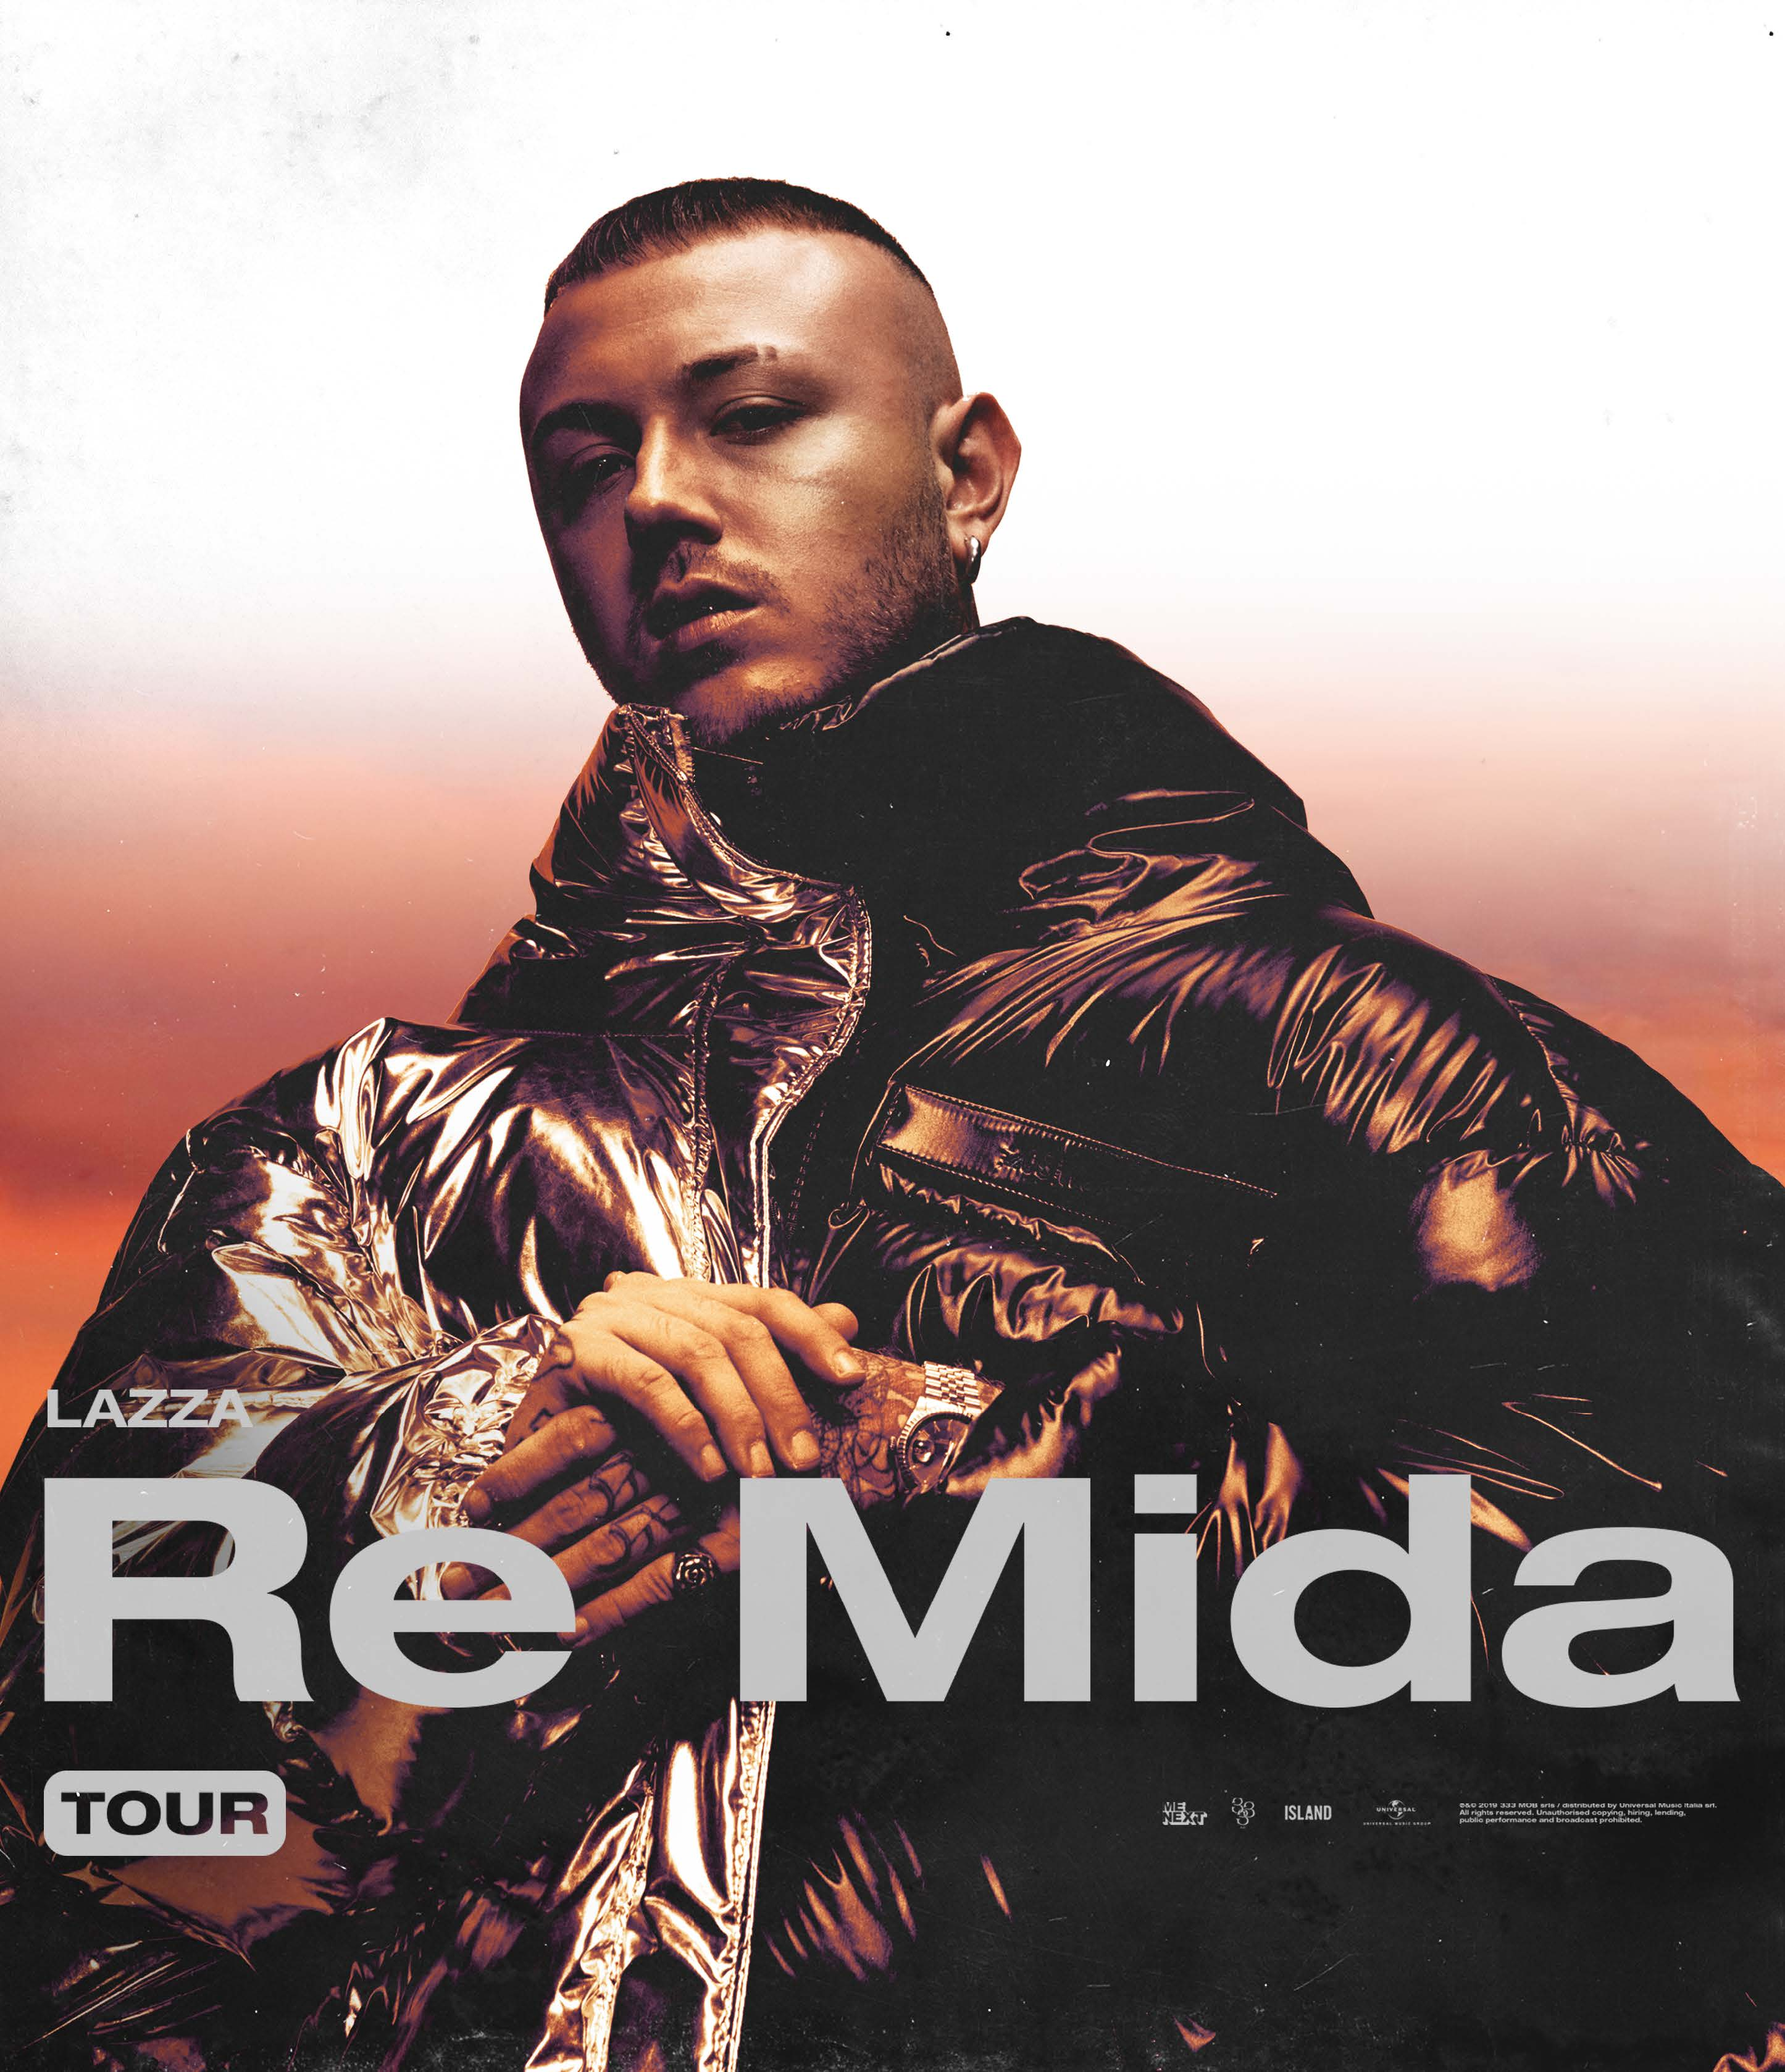 LAZZA Re Mida Tour